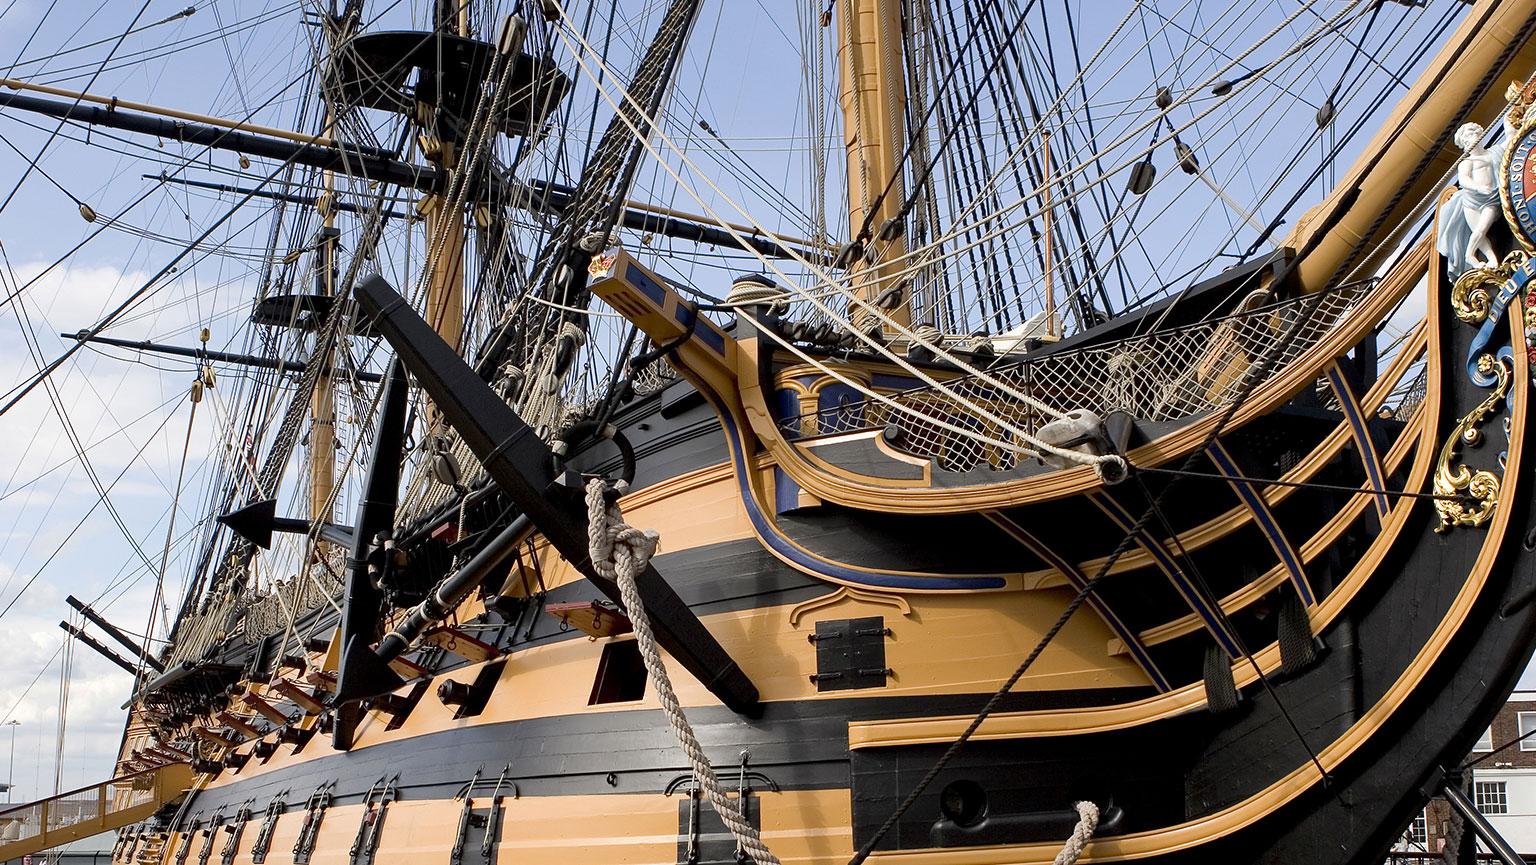 1805  Trafalgar—Nelson Thwarts Napoleon